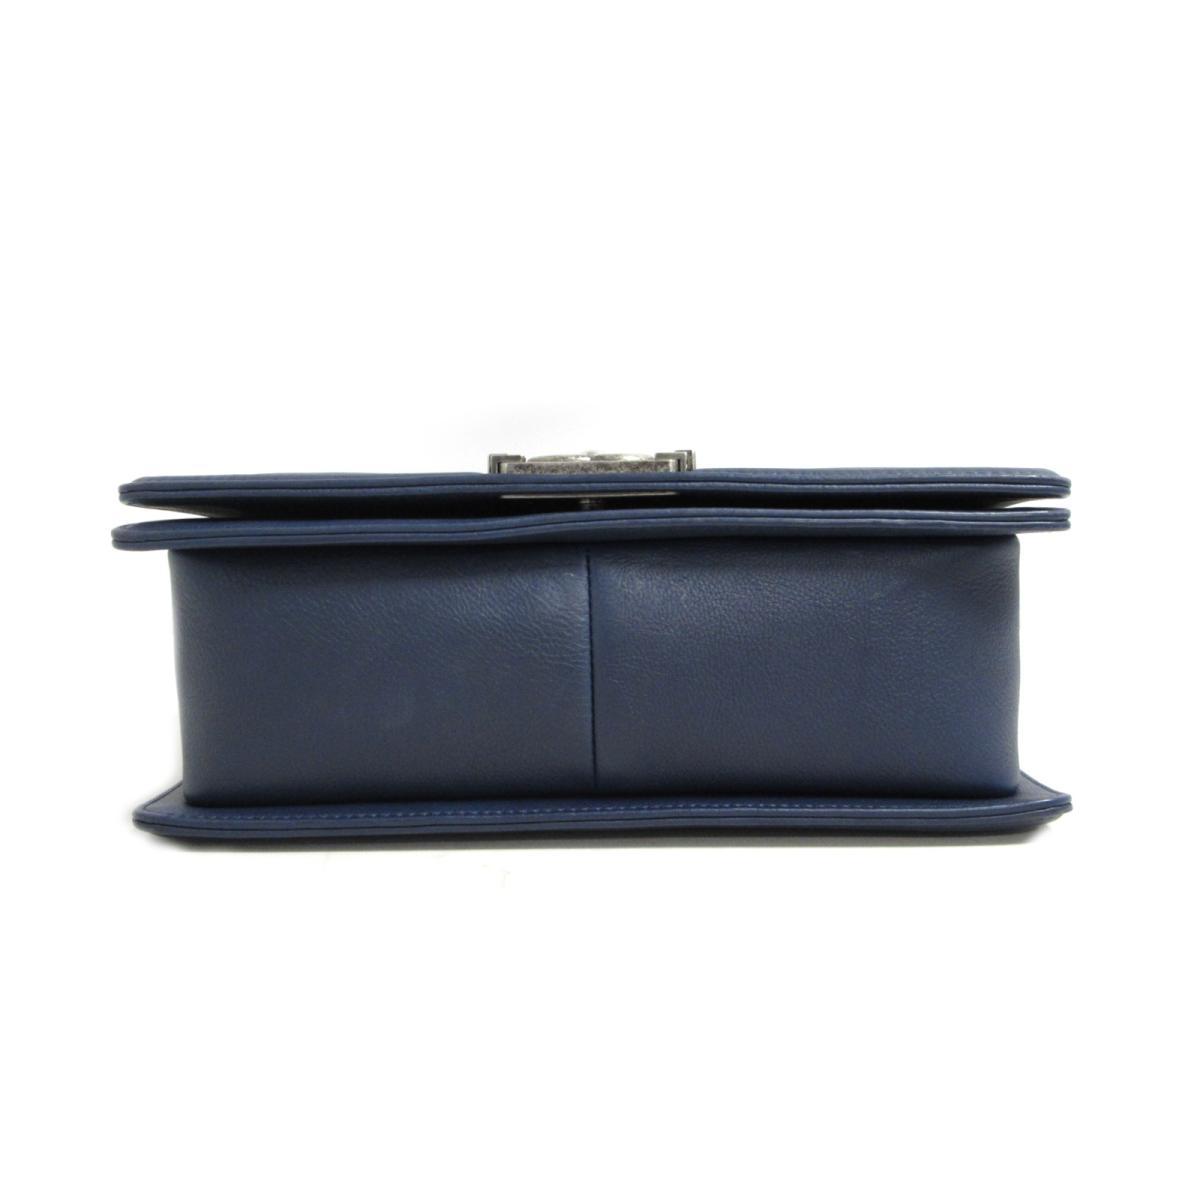 68d4d0d5ec36f6 BRANDOFF: Chanel boy Chanel chain shoulder bag bag lady leather navy ...